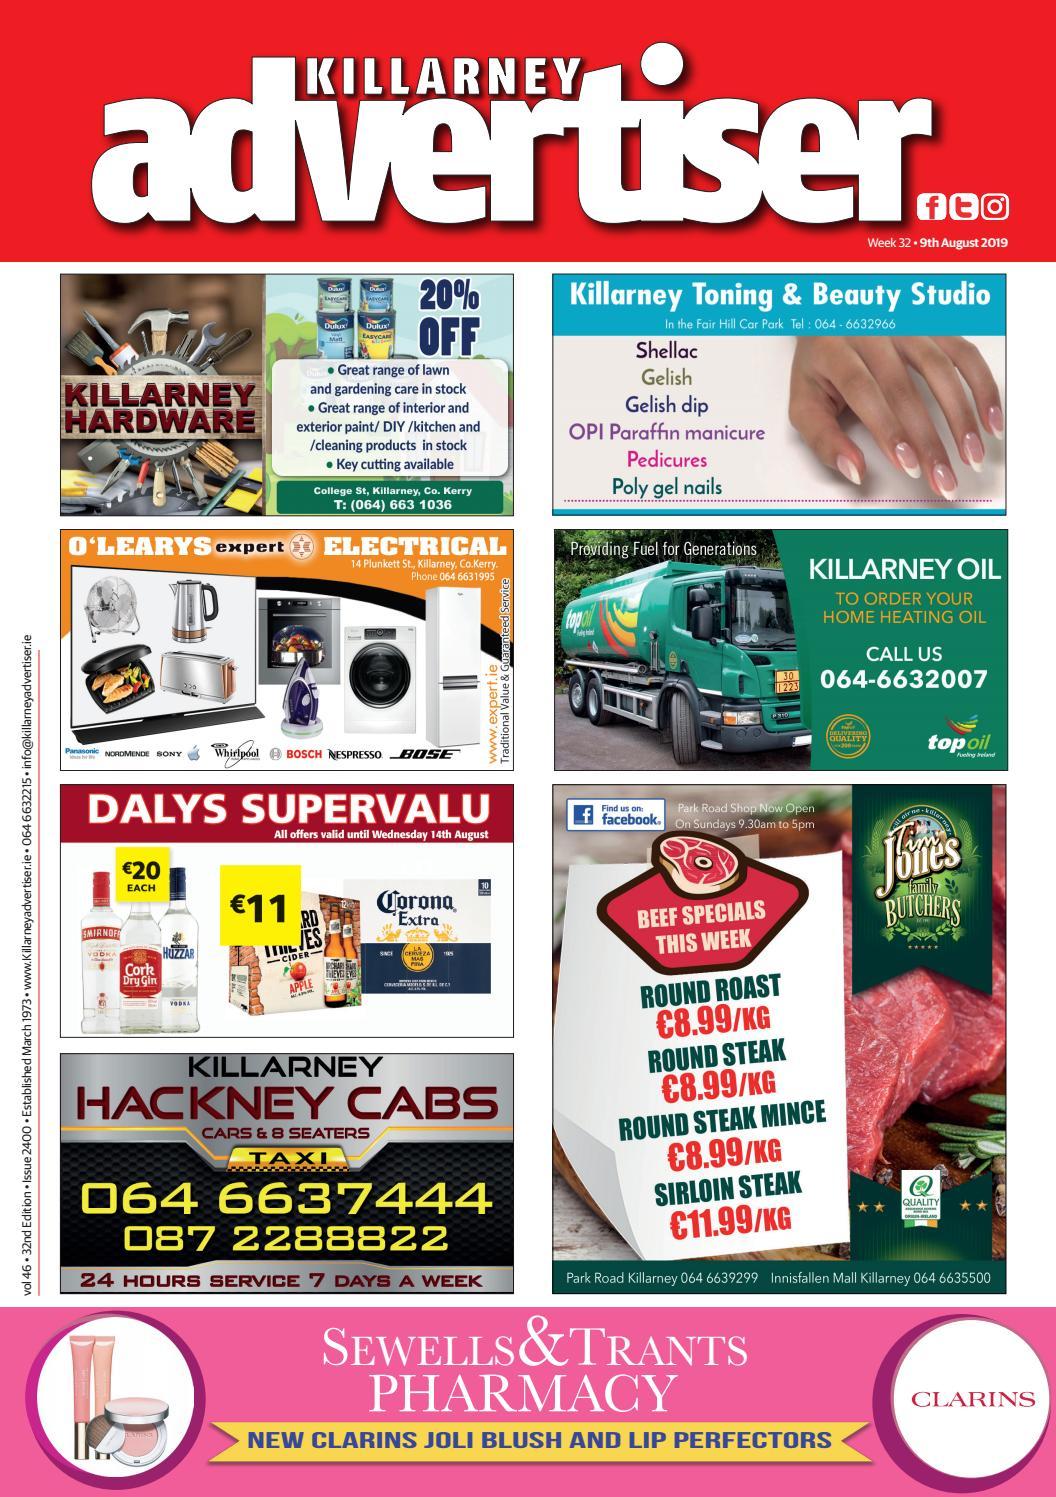 Killarney Advertiser 9th August 2019 By Killarney Advertiser Issuu